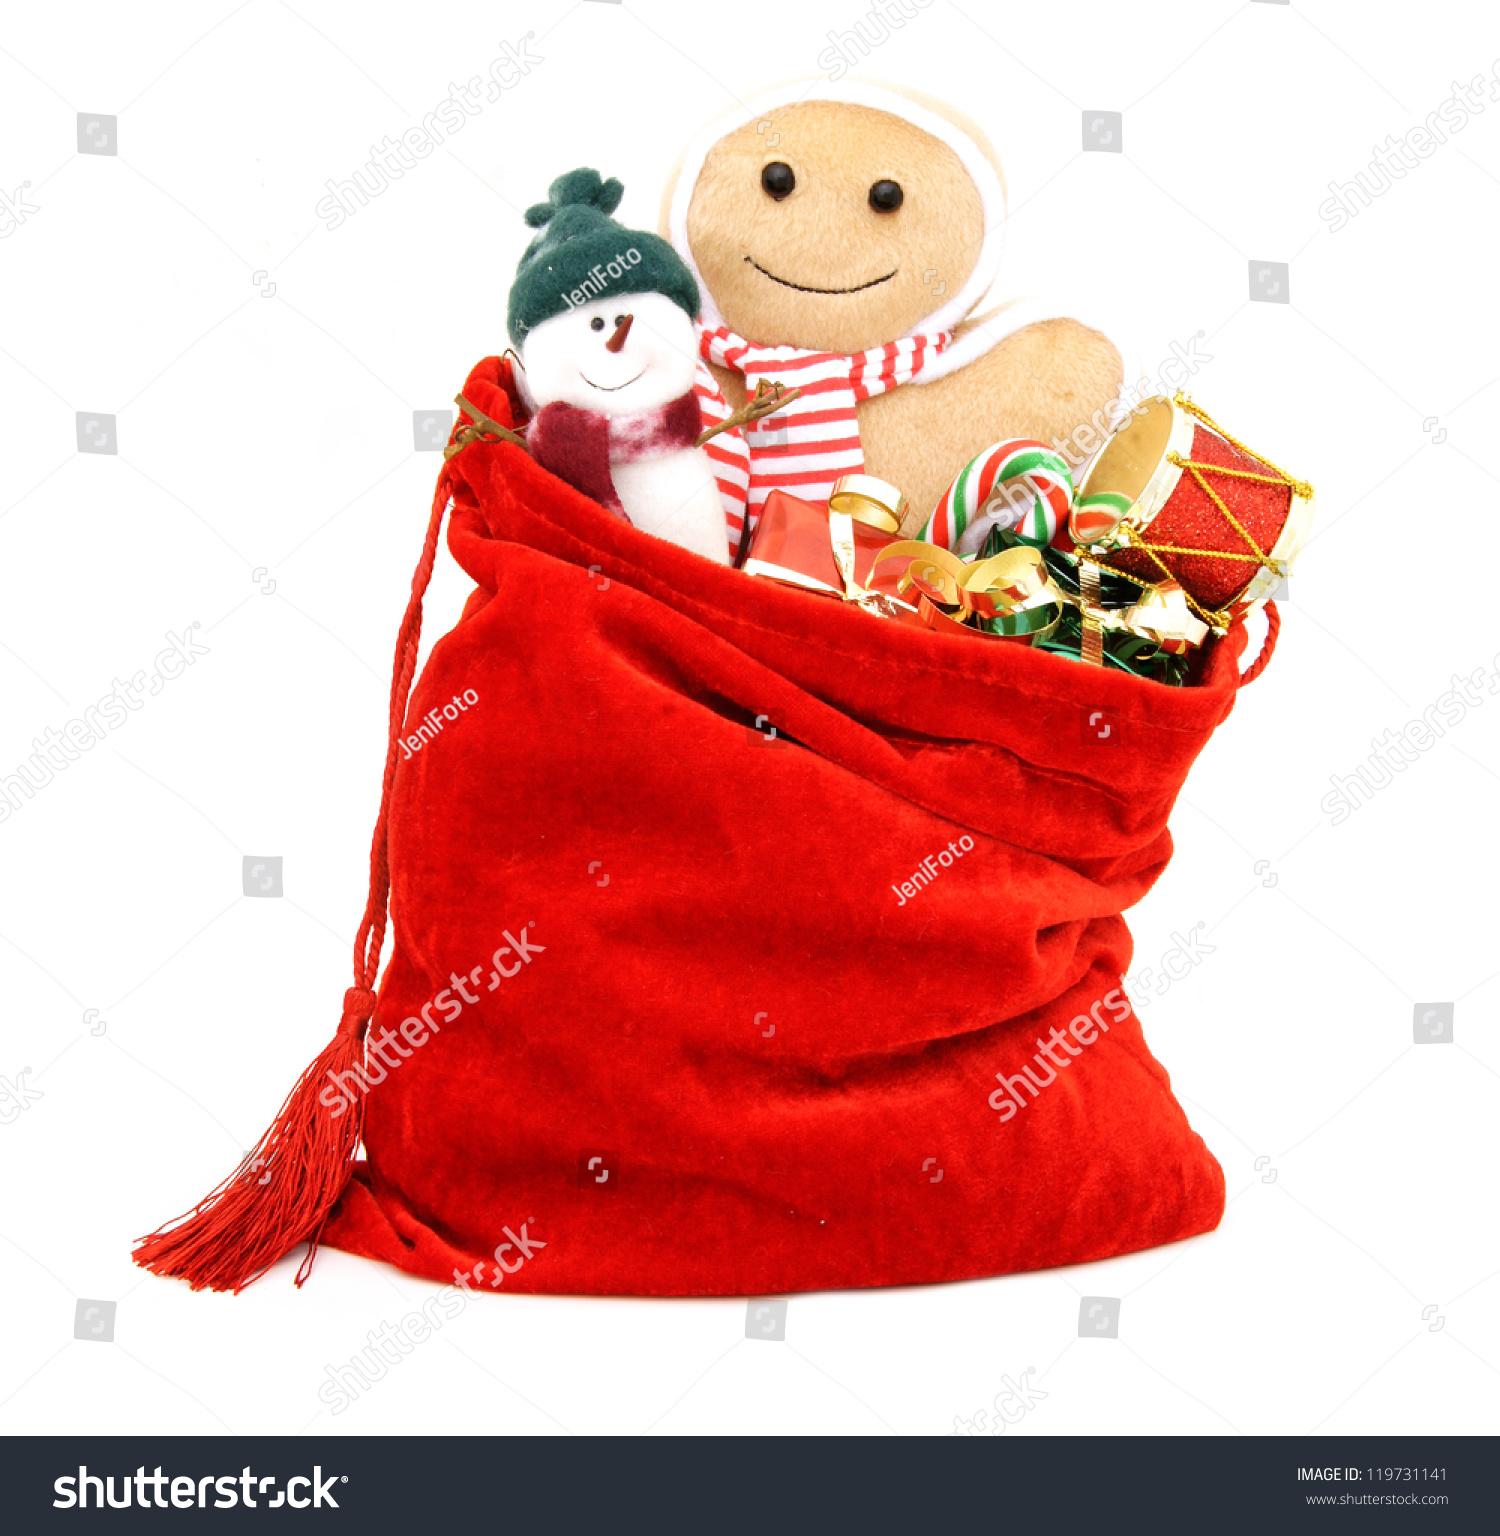 Sack Of Toys : Santas gift bag full toys gifts stock photo